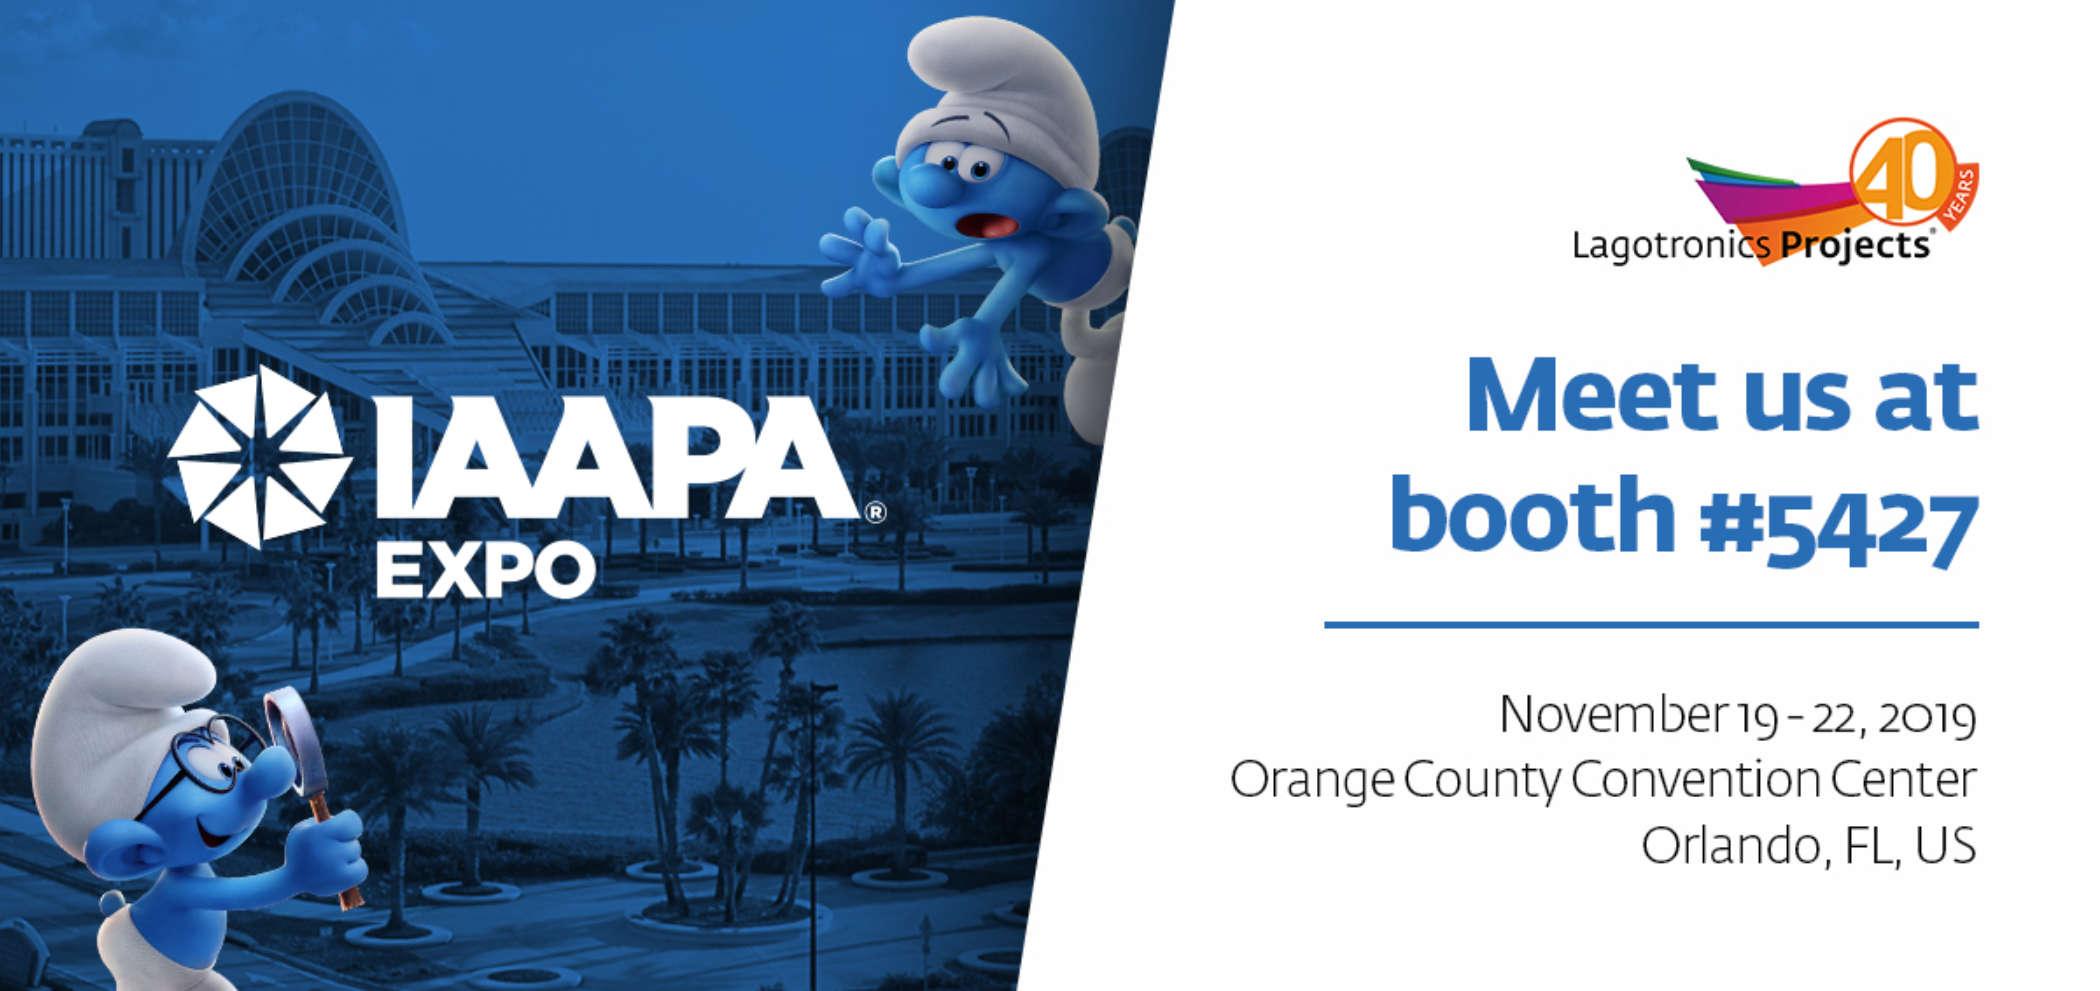 Iaapa Expo Lagotronics Projects 2019